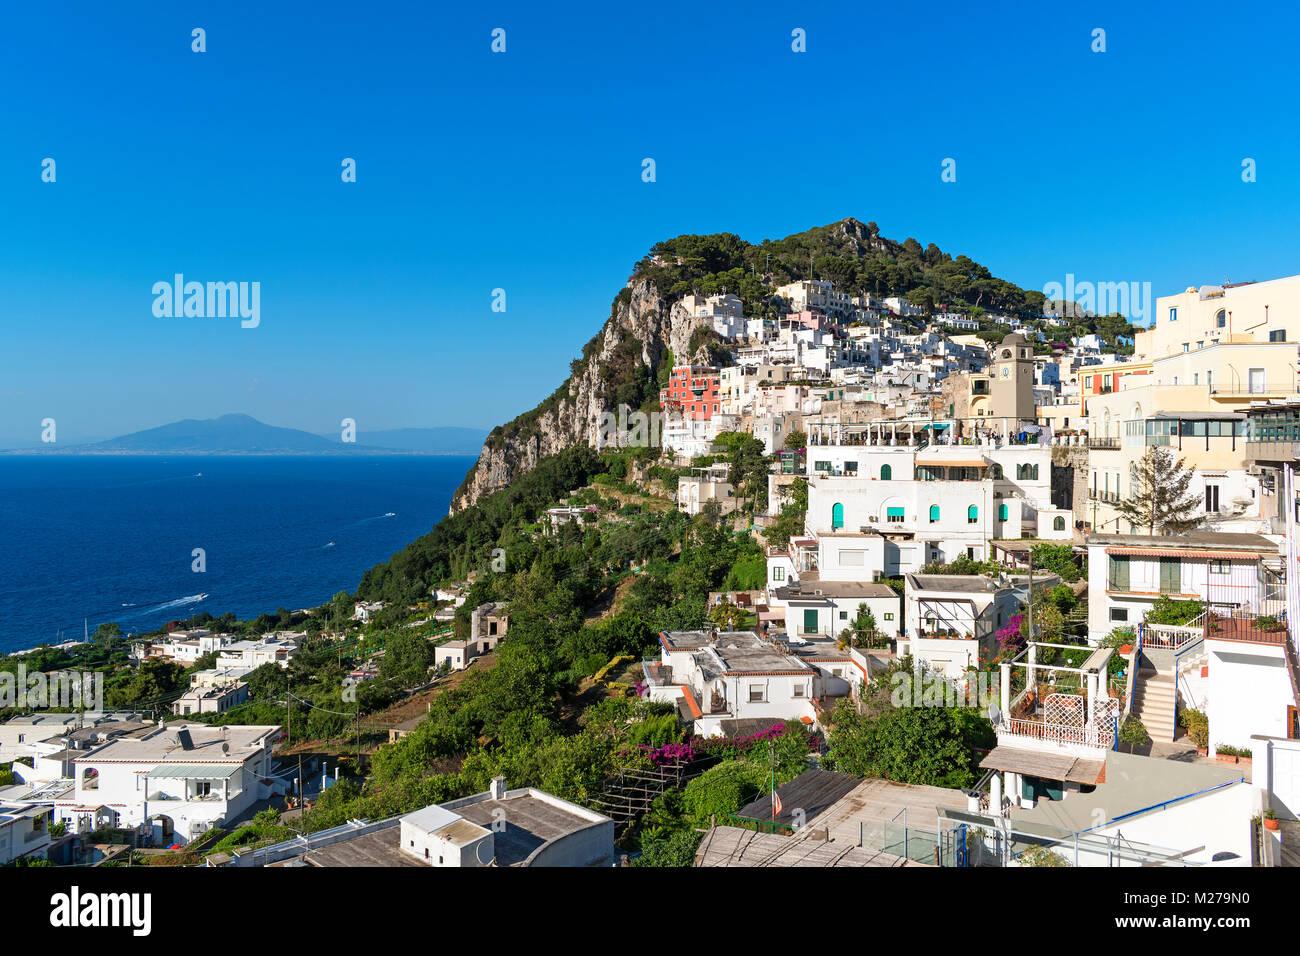 the island of capri in the bay of naples, campania, italy, - Stock Image